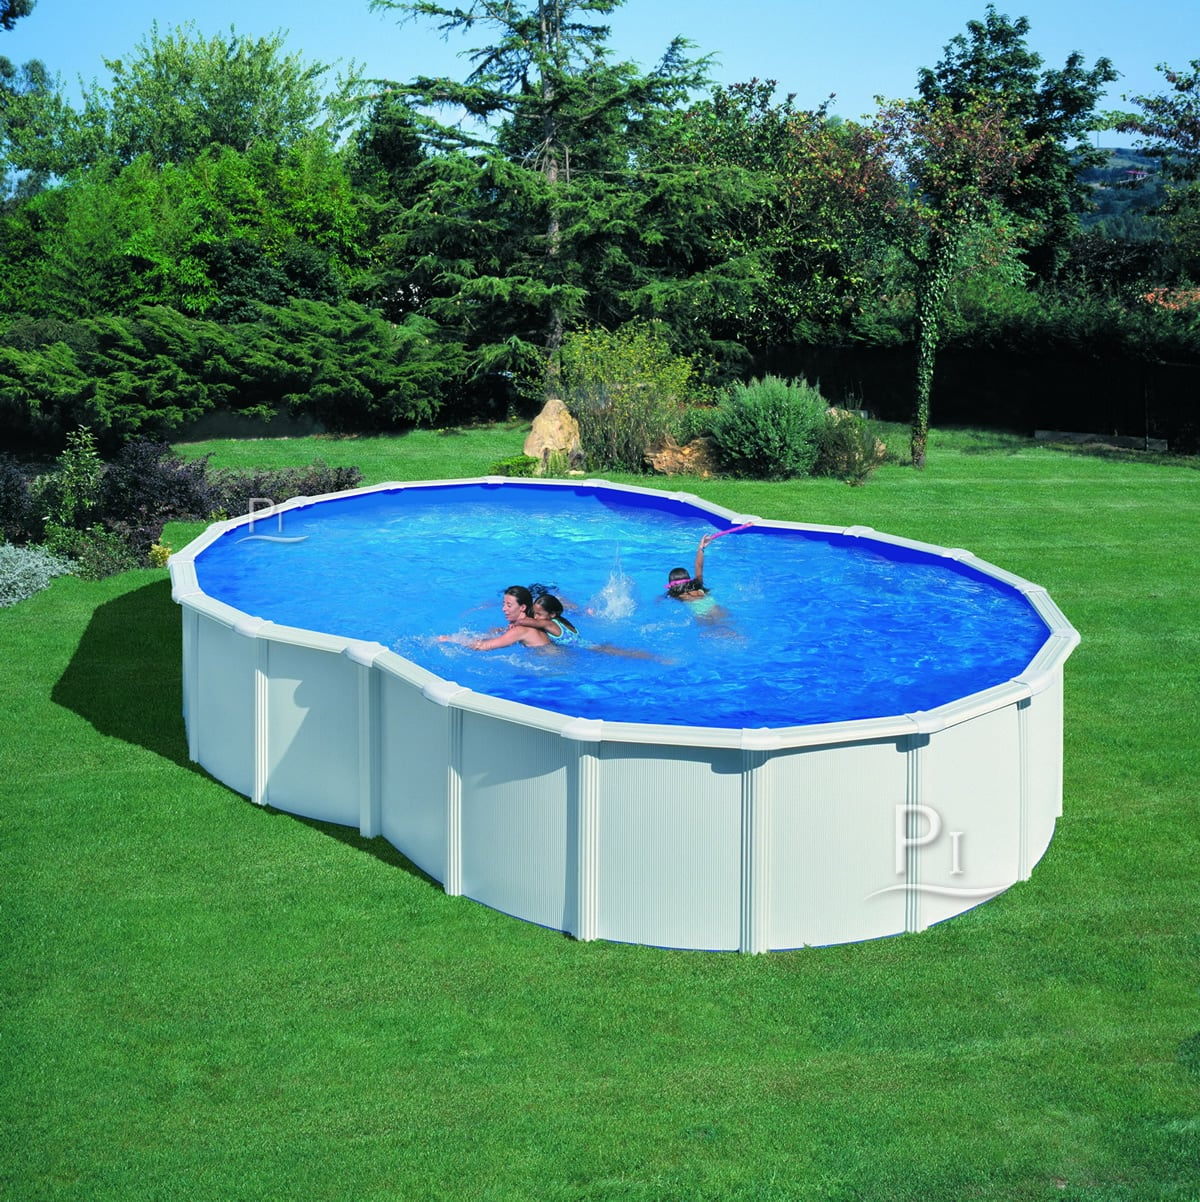 Piscina fuori terra gre in acciaio varadero 710 piscine - Piscine in acciaio fuori terra ...